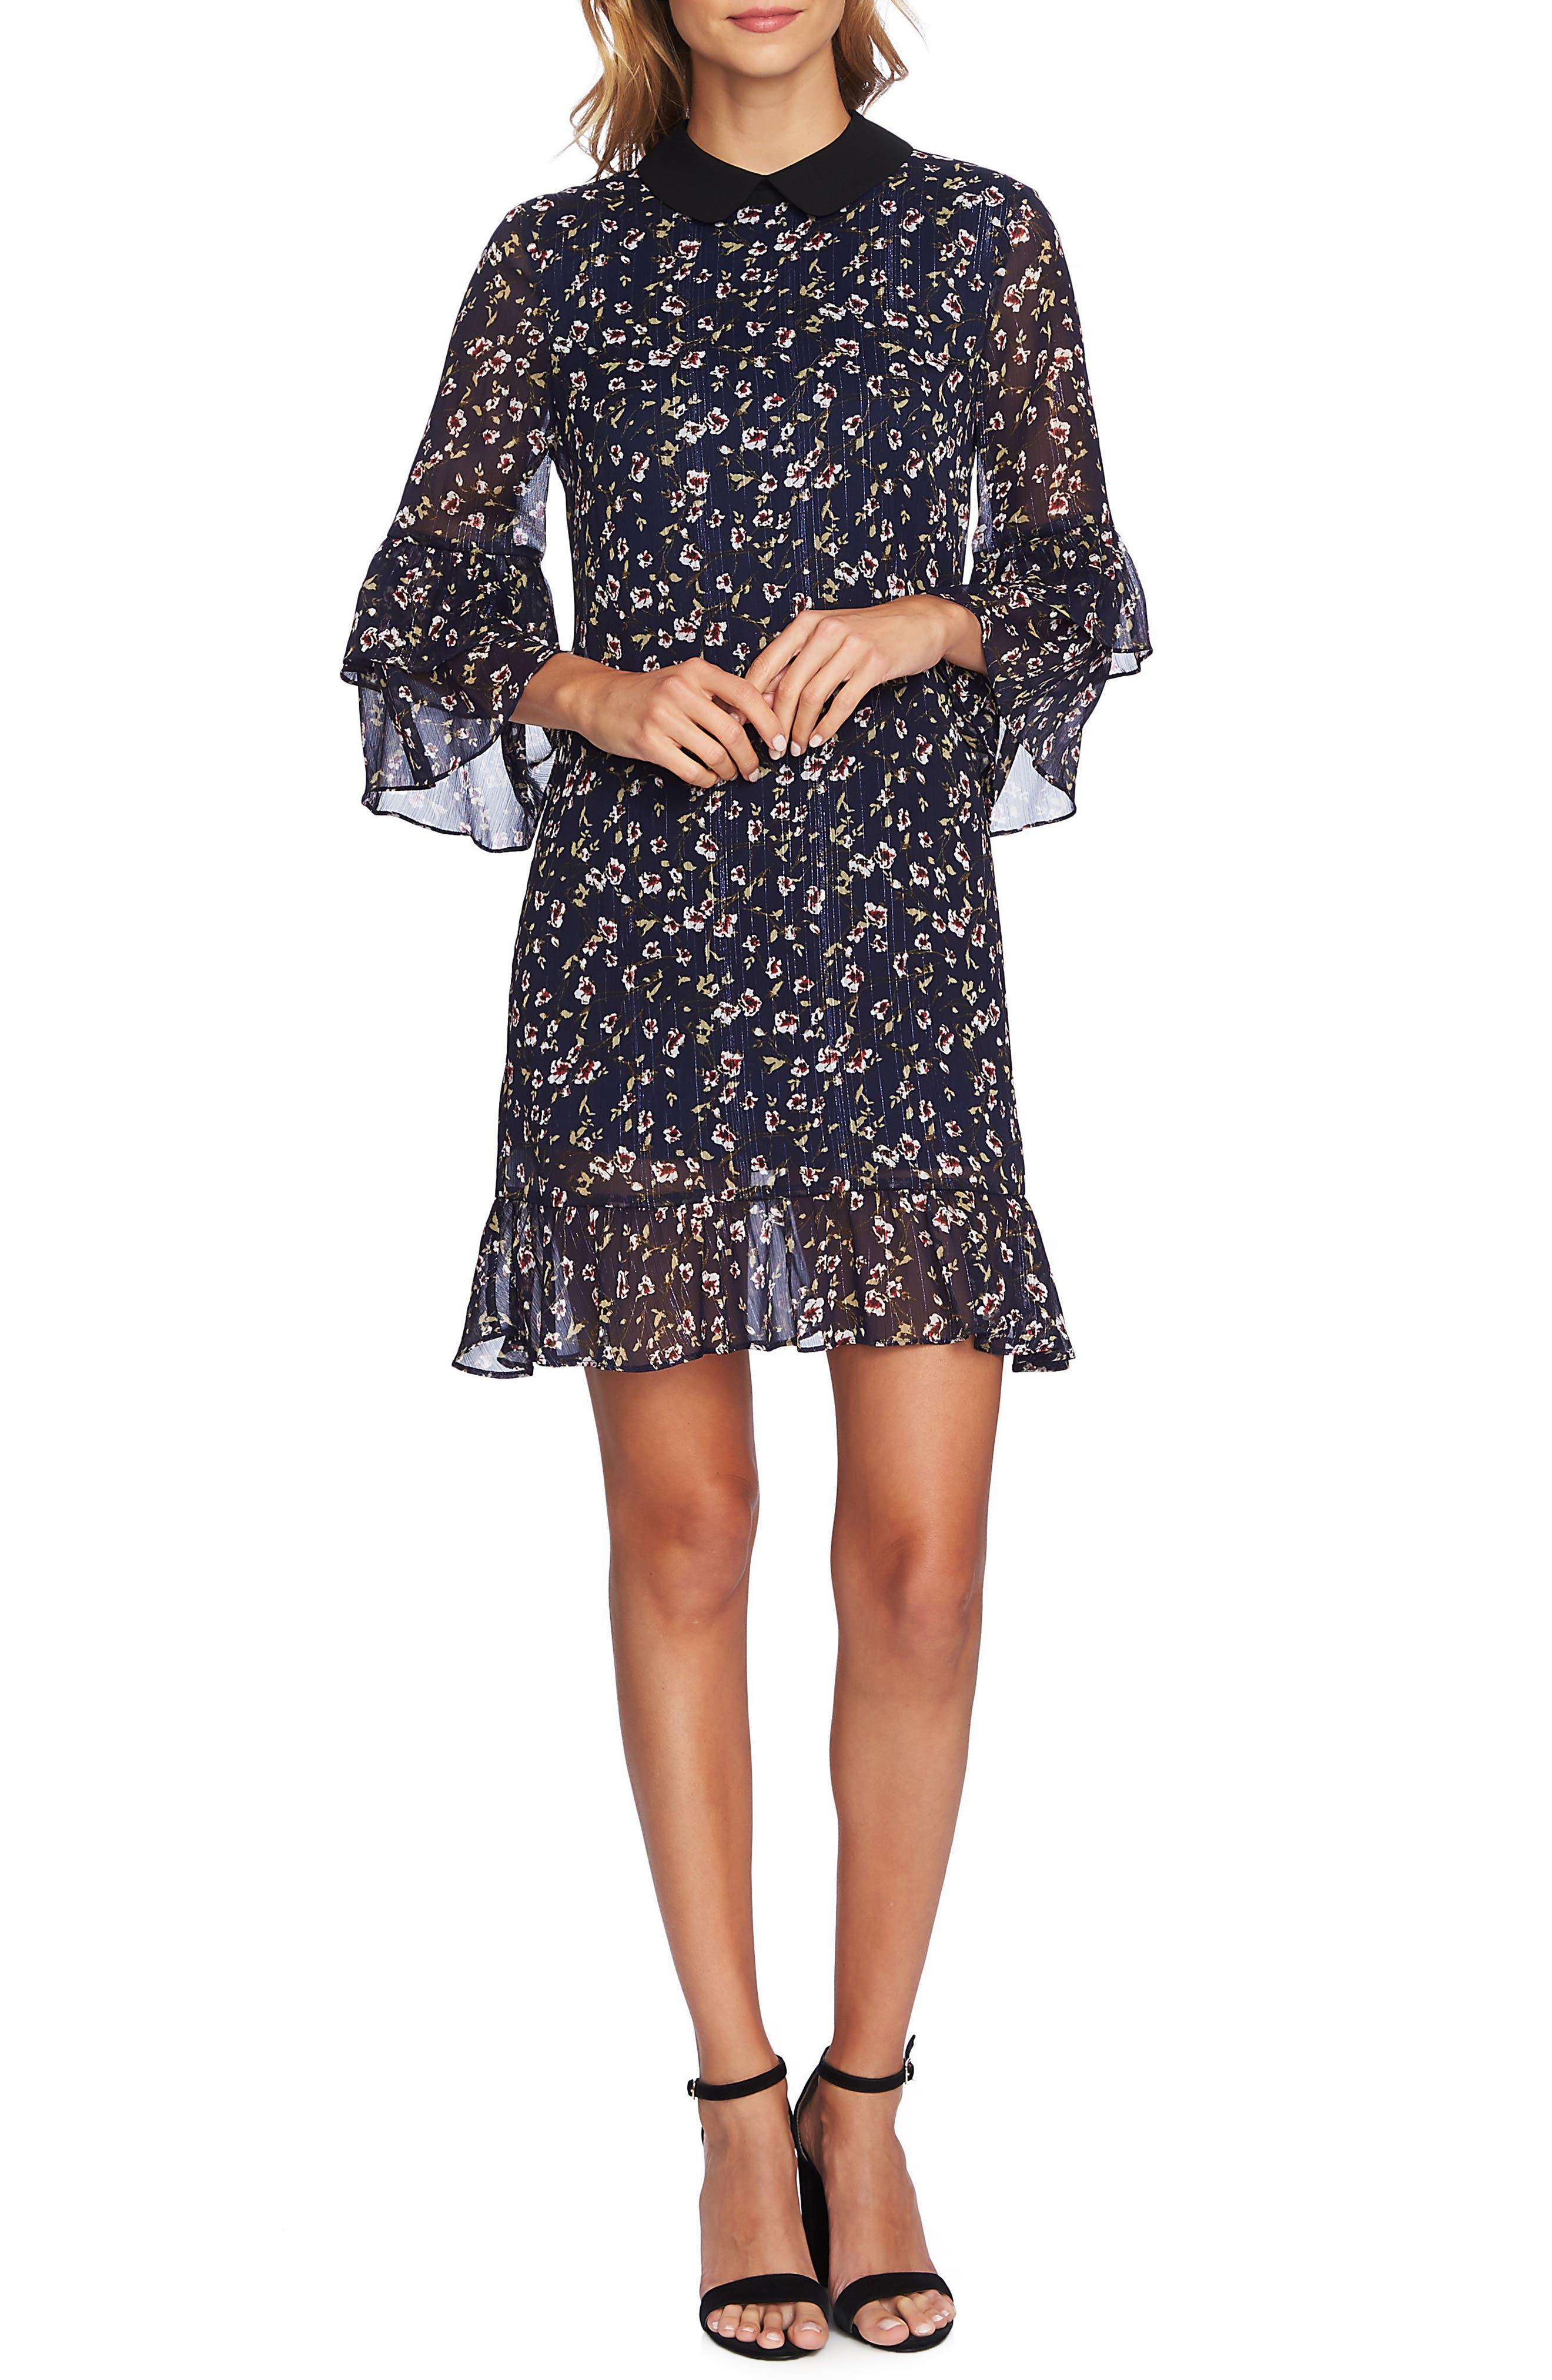 Festive Metallic Stripe Floral Ruffle Dress,                             Main thumbnail 1, color,                             MIDNIGHT BLOOM